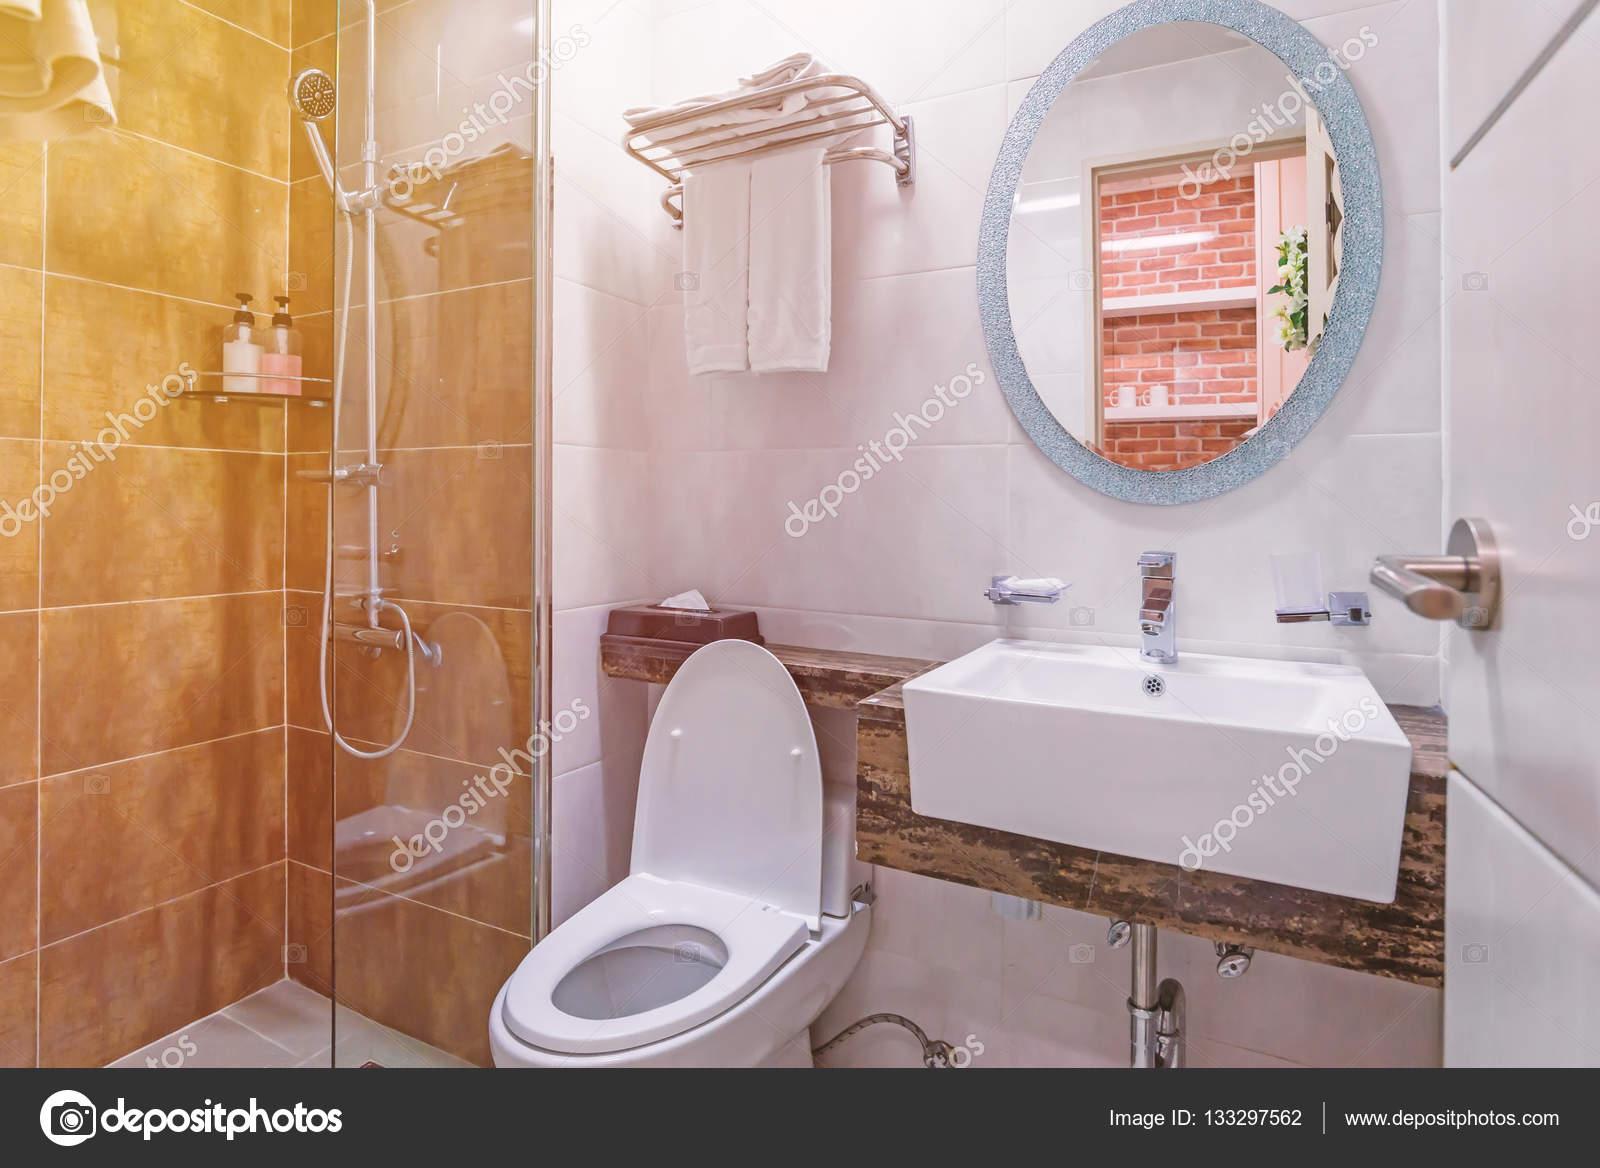 Badkamer En Toilet : Interieur van de badkamer en toilet in modern toilet u stockfoto